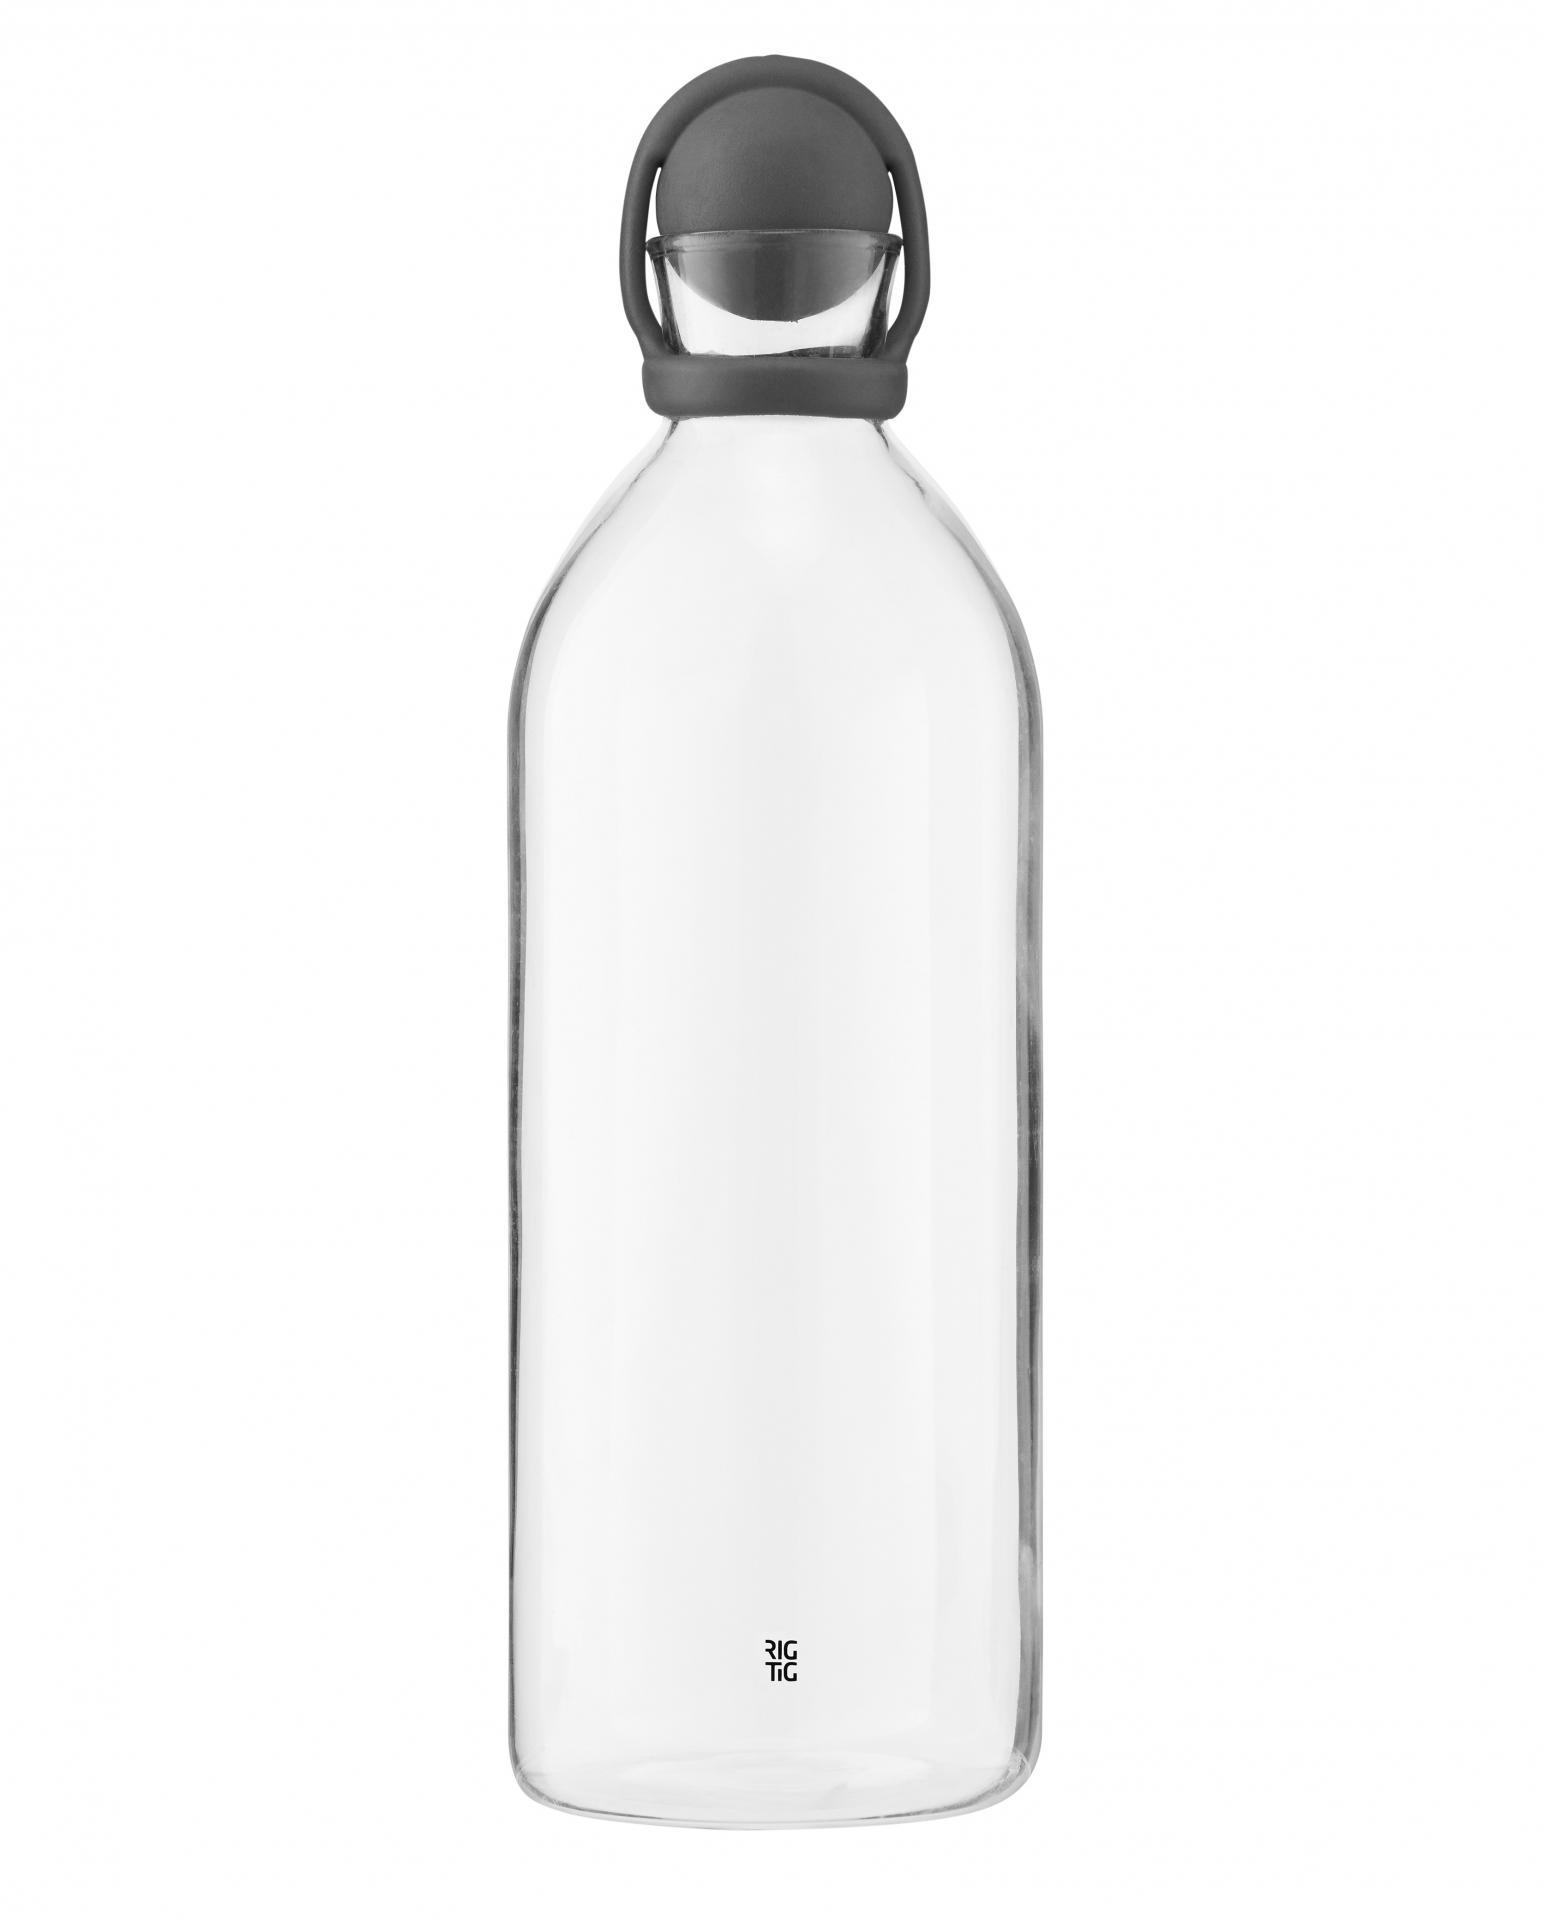 RIG-TIG Skleněná karafa Cool-it Dark grey, šedá barva, čirá barva, sklo, plast